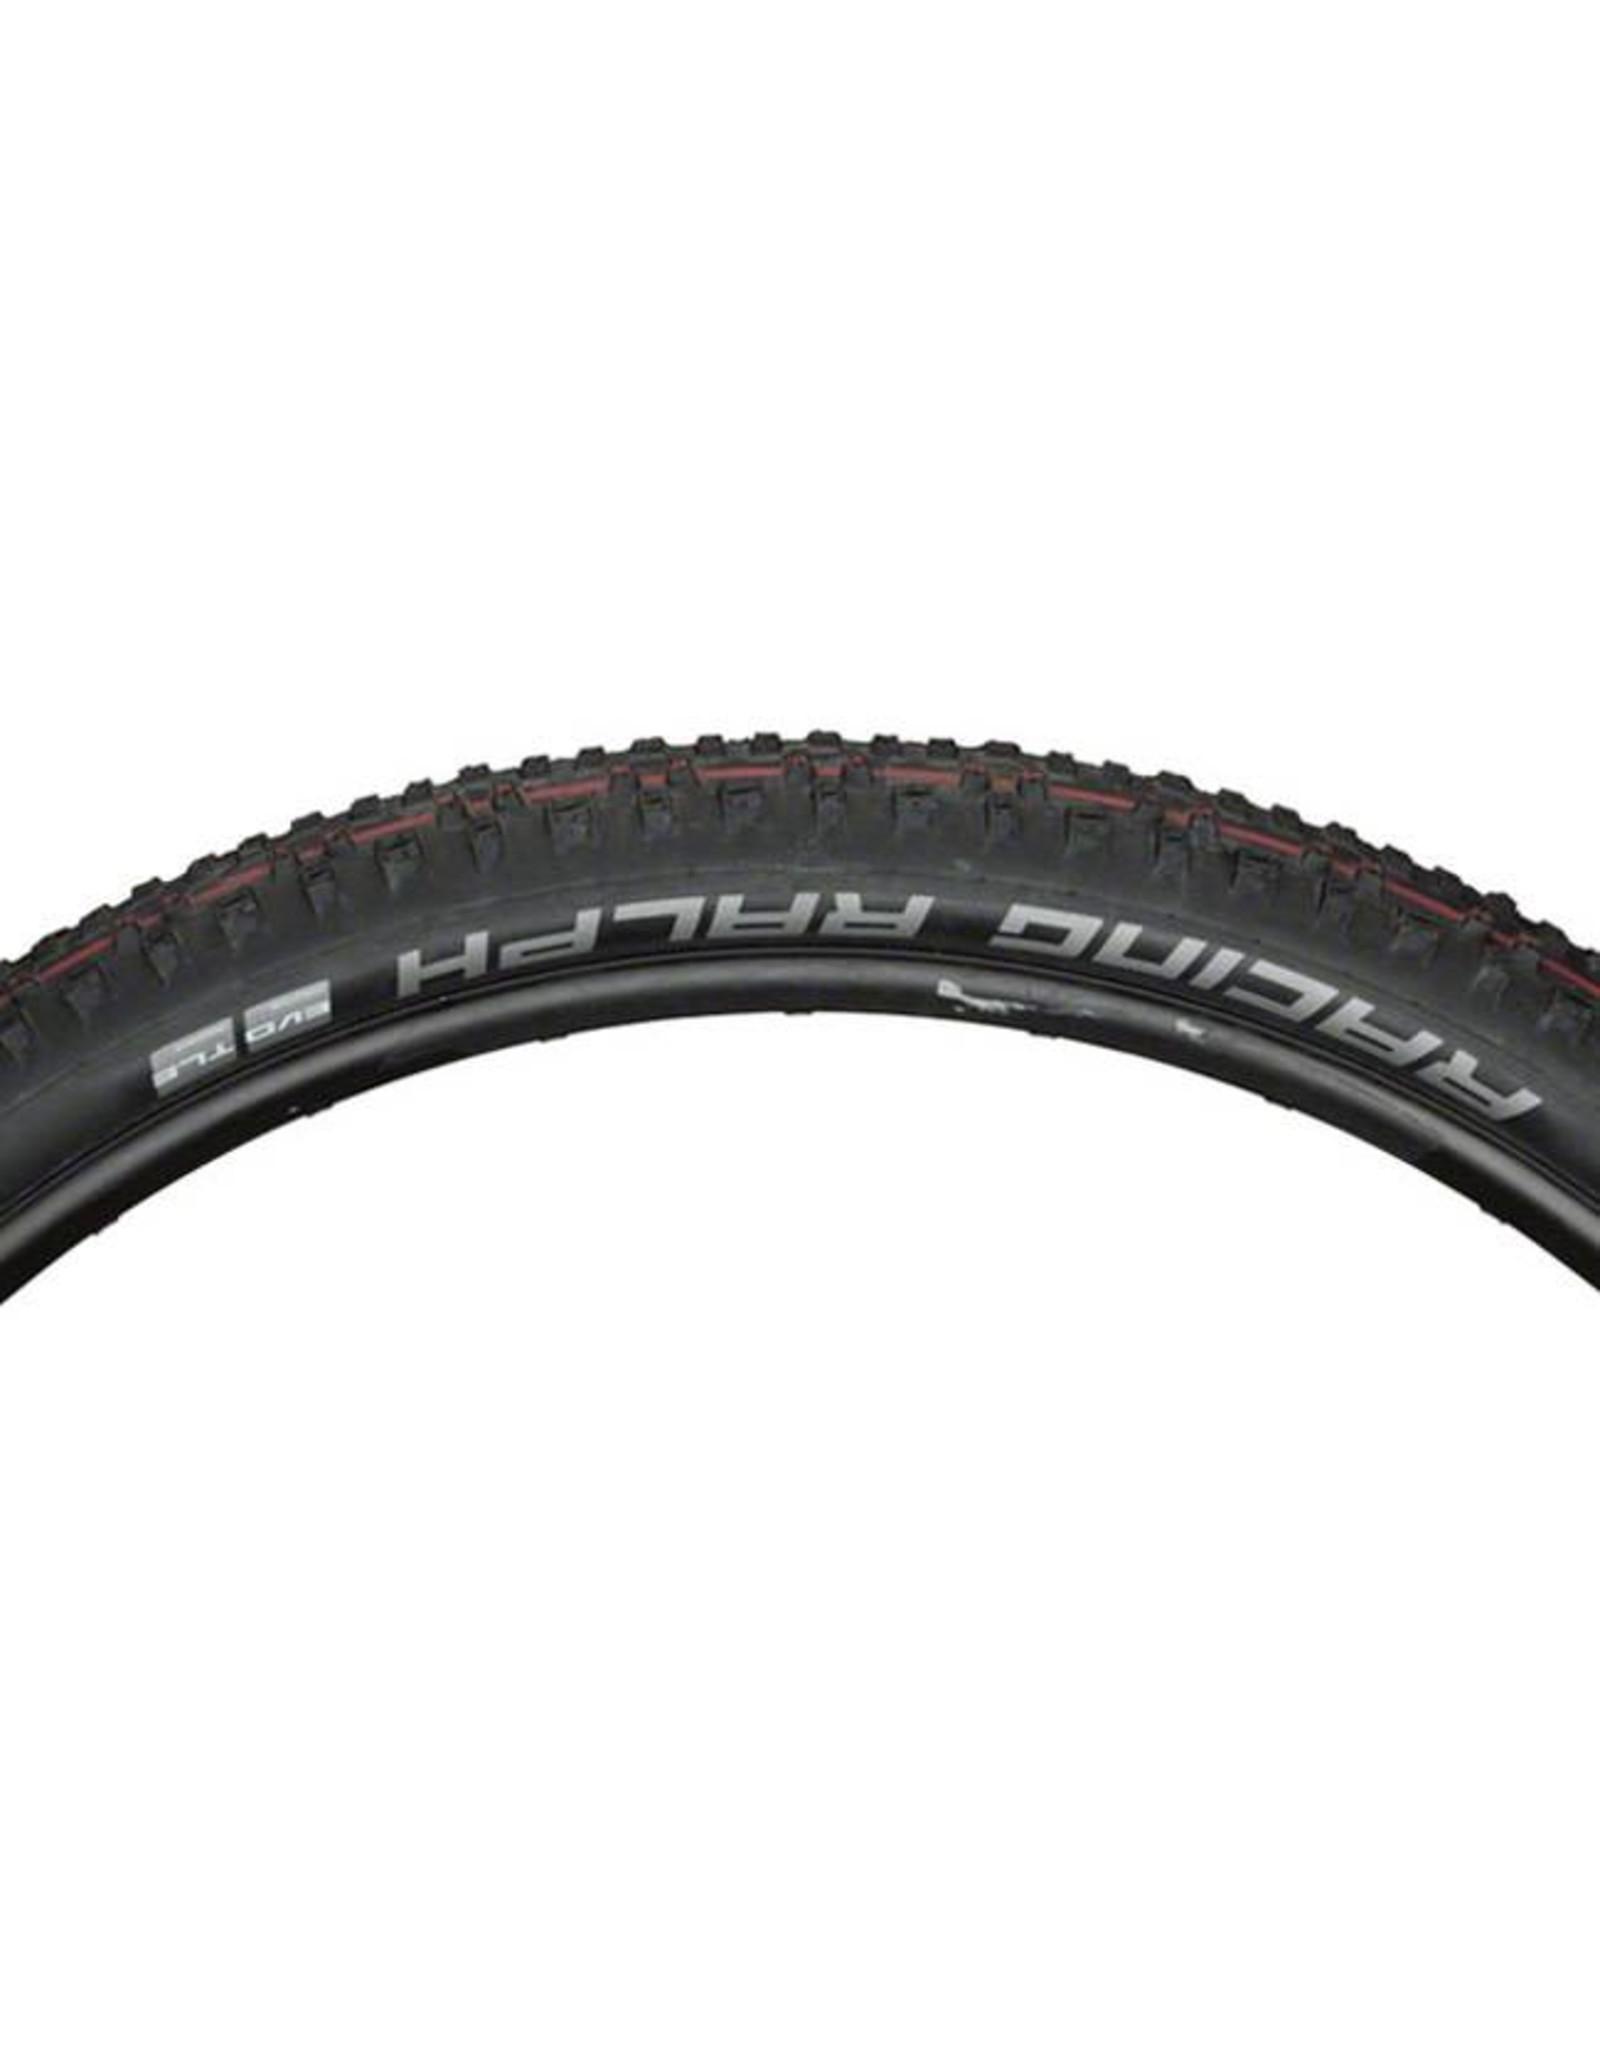 "Schwalbe Schwalbe Racing Ralph Tire: 29 x 2.10"", Folding Bead, Evolution Line, Addix Speed Compound, SnakeSkin, Tubeless Easy, Black"